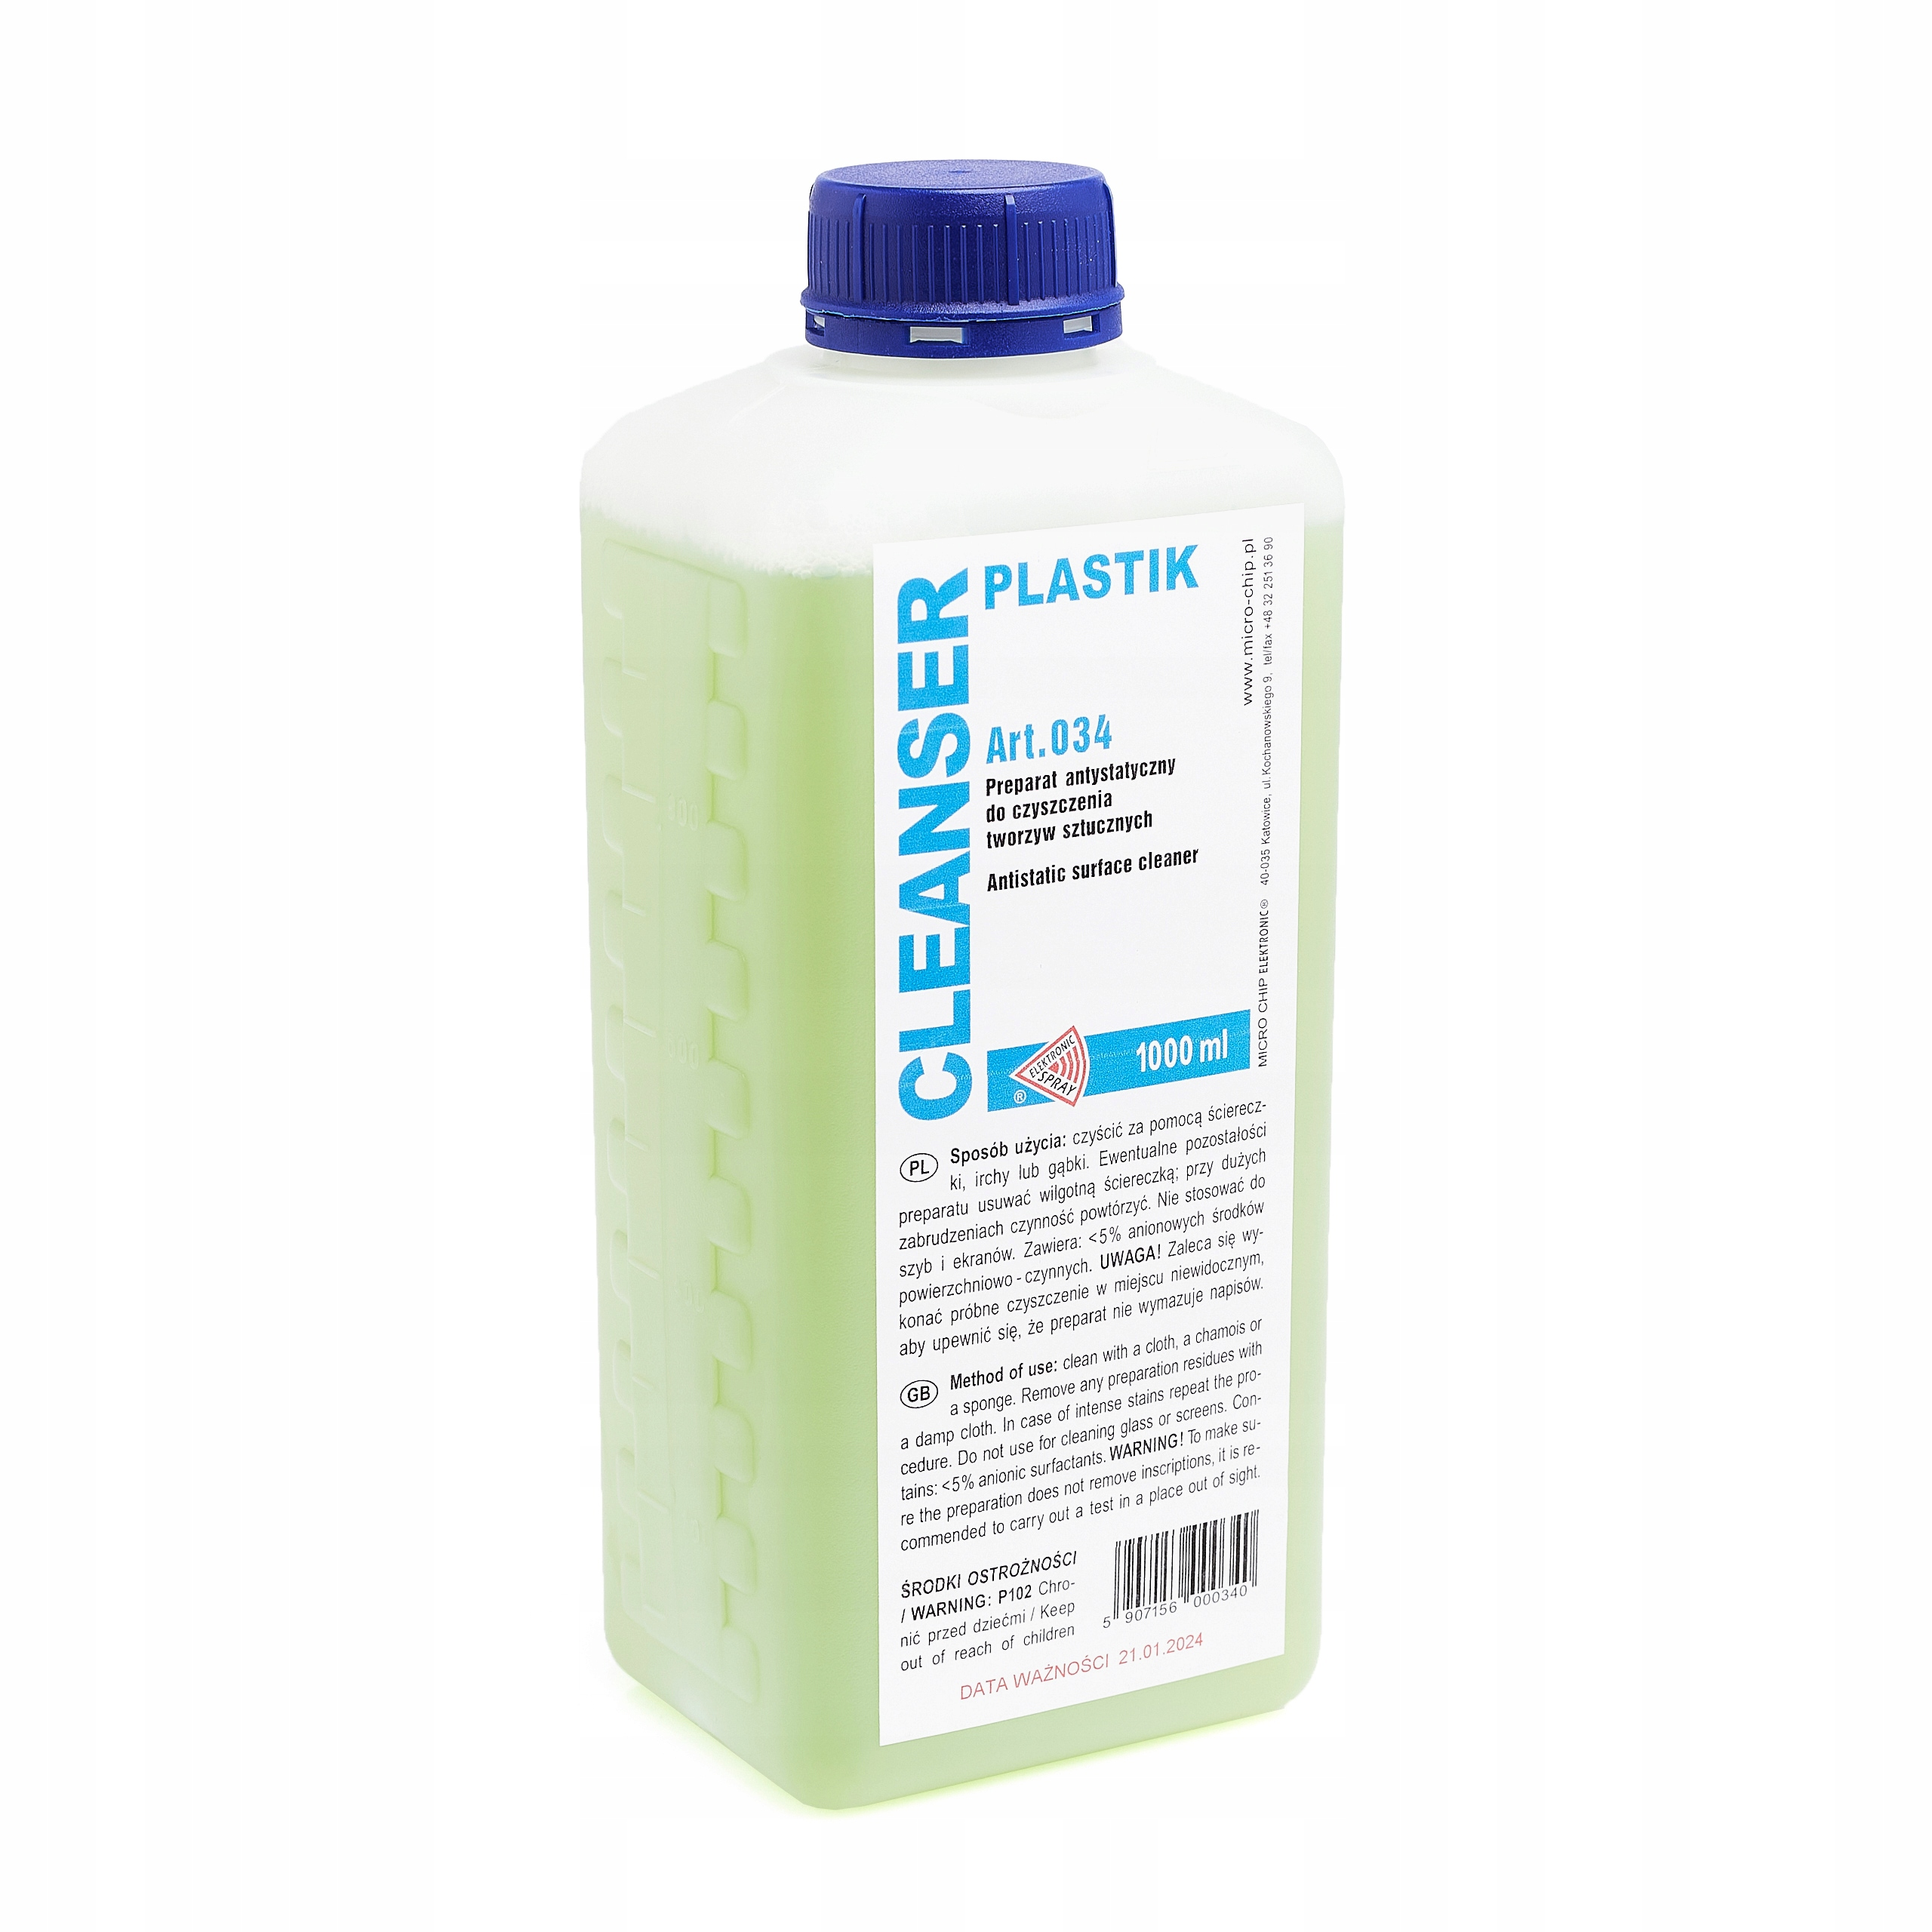 CLEANSER PLASTIK 1L PVC CLEANING LIQUID RTV